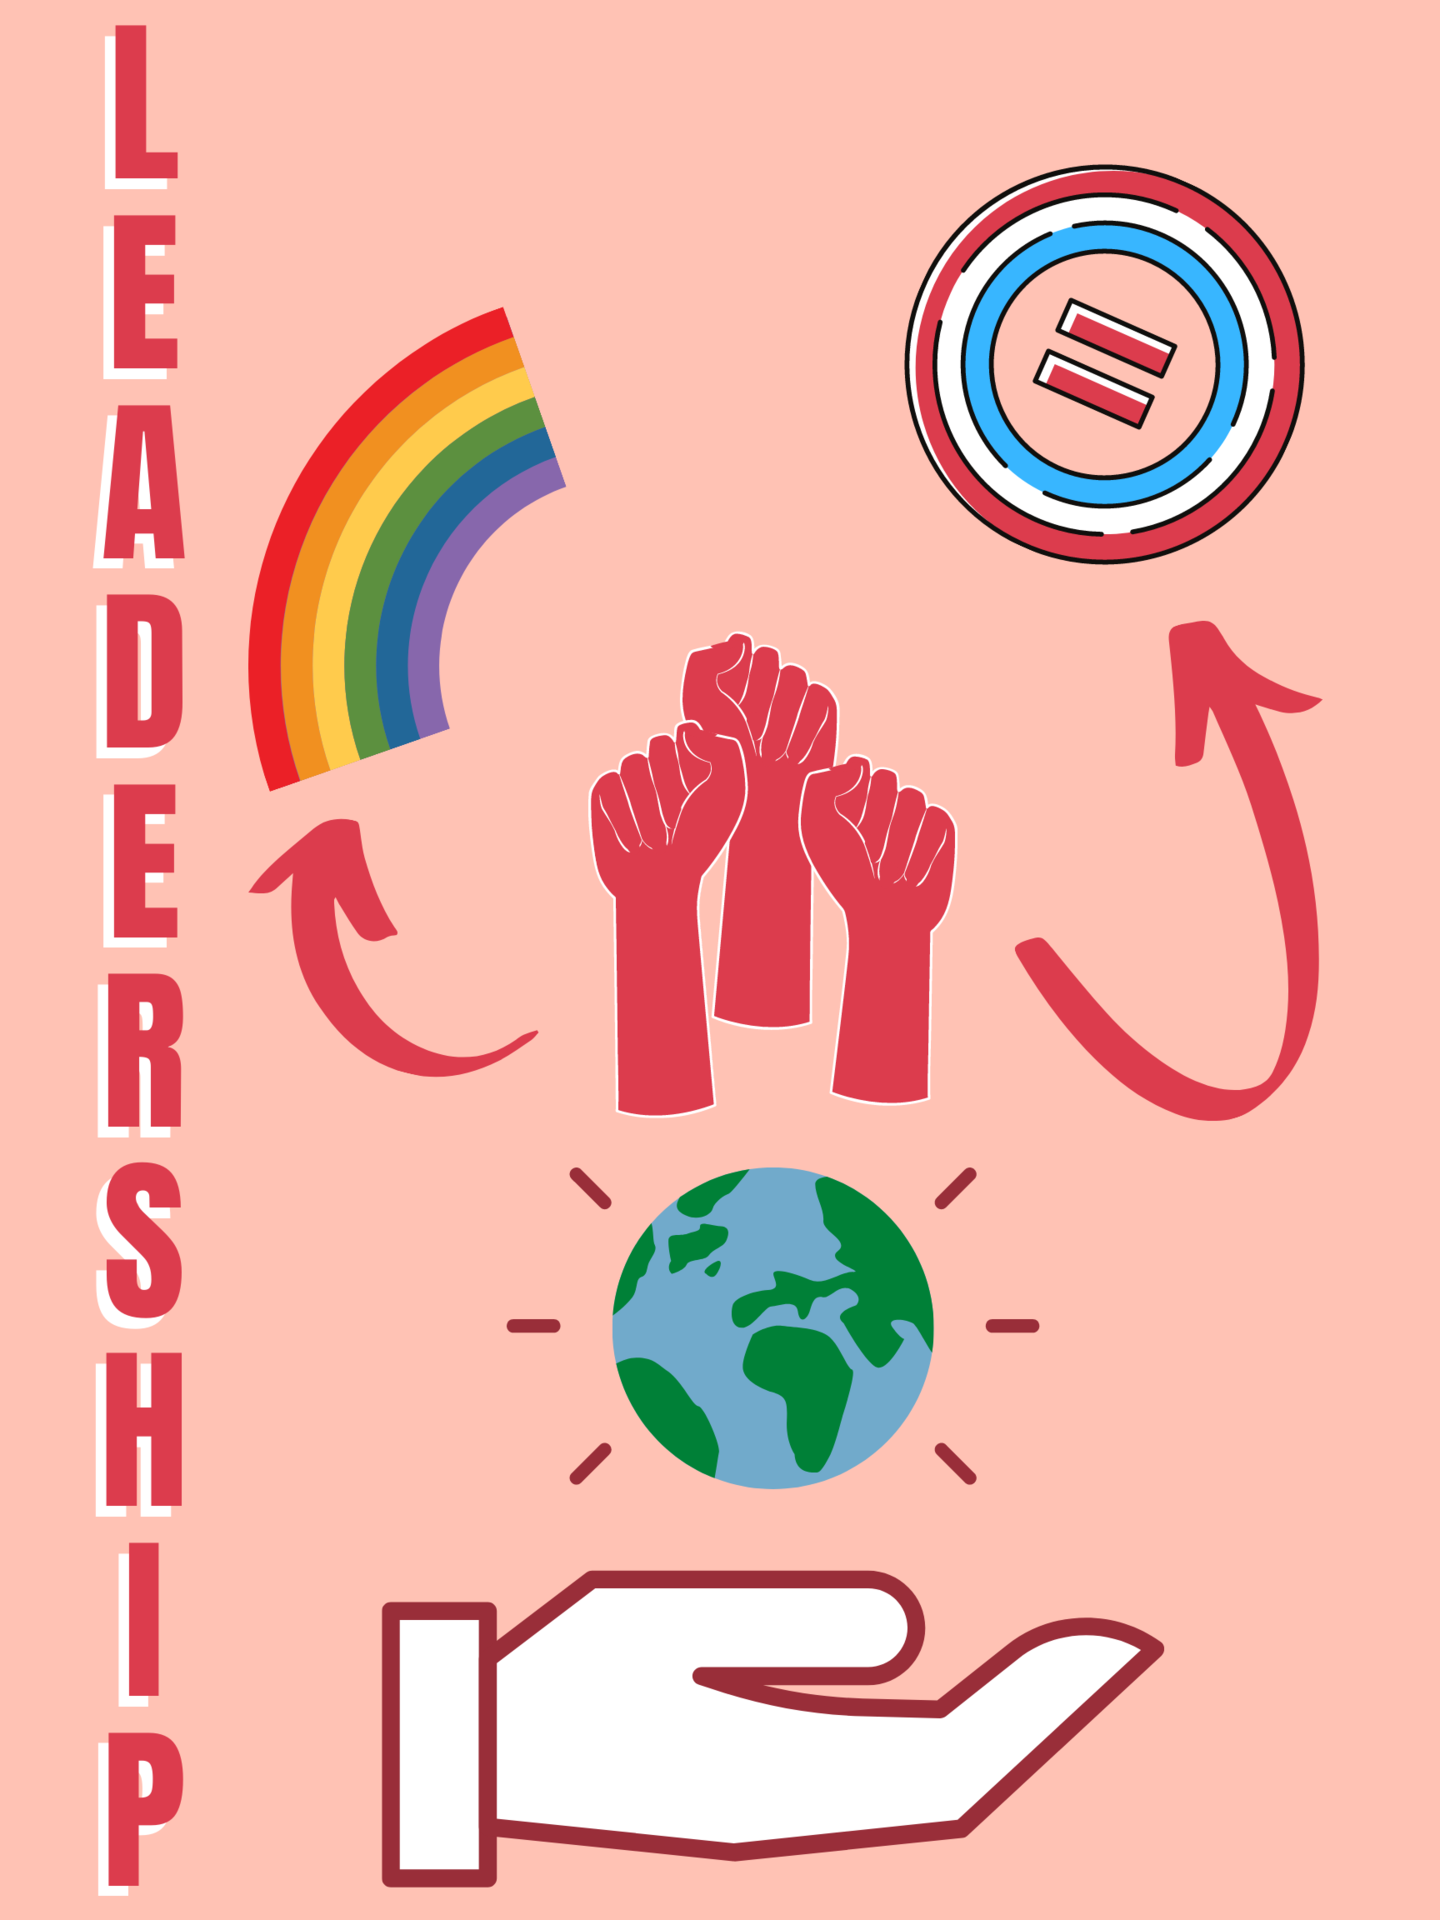 Valentina's Leadership Poster